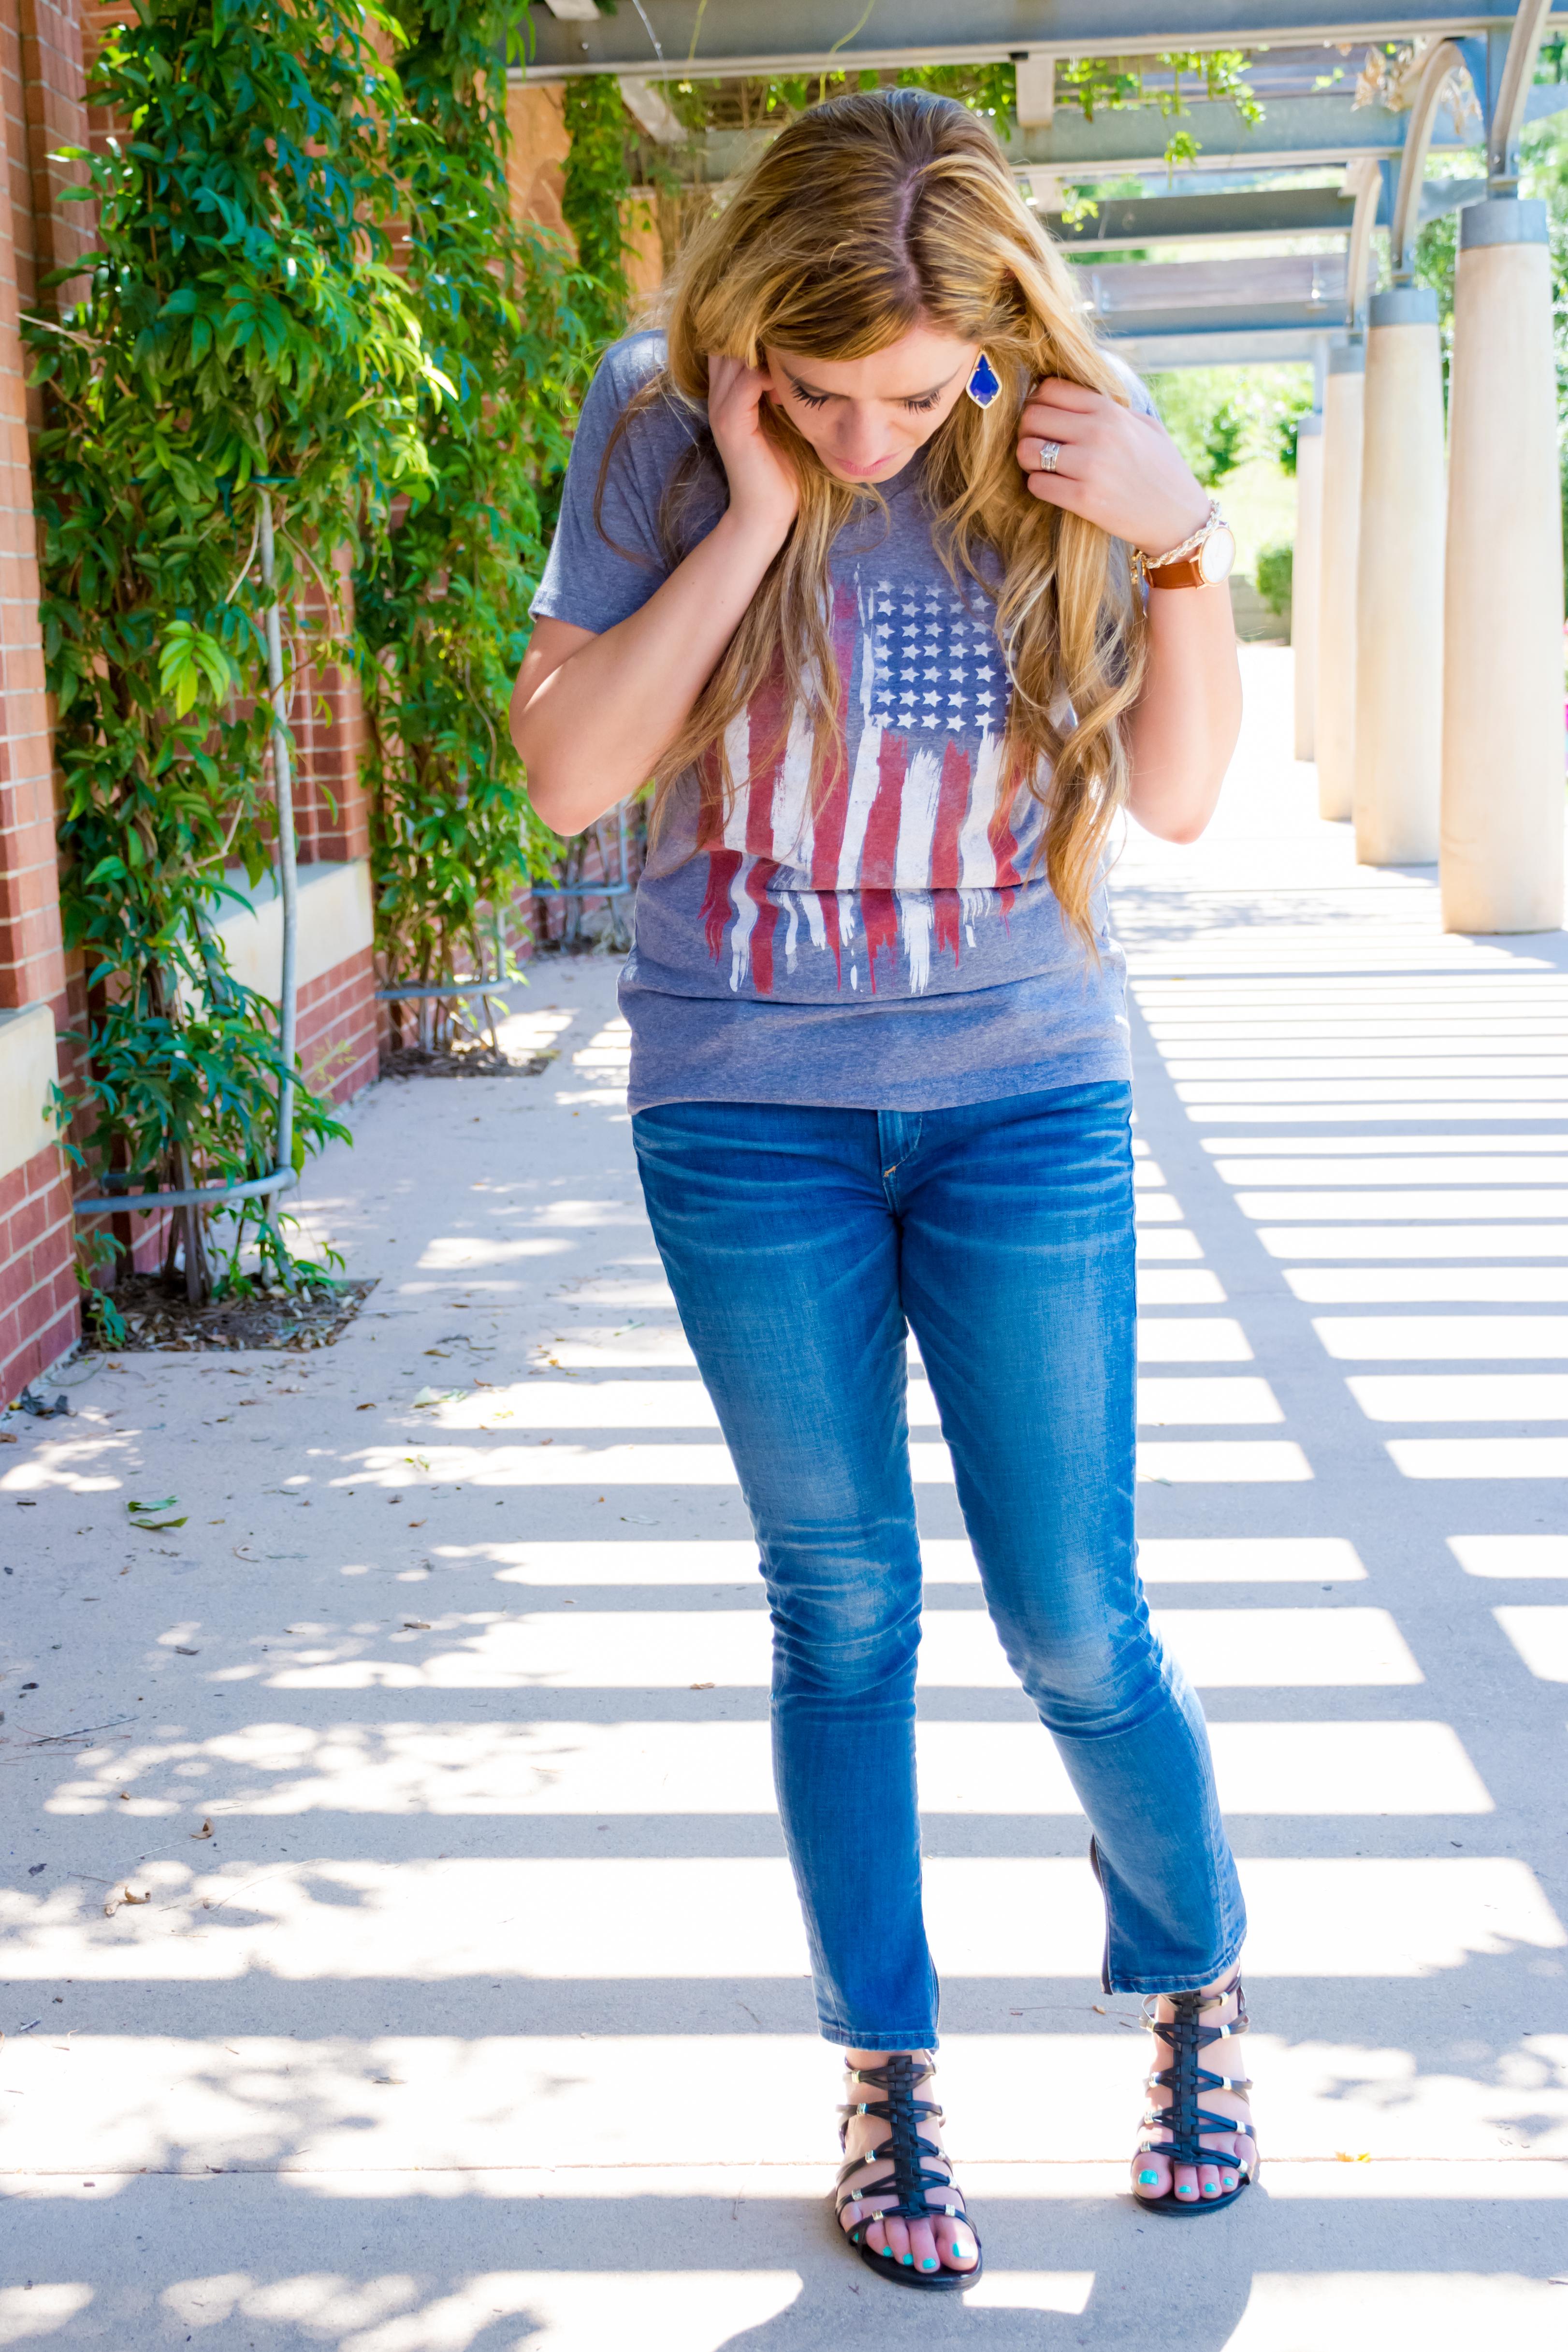 Texas, tee, flag, mom fashion, skinny jeans, gladiator sandals